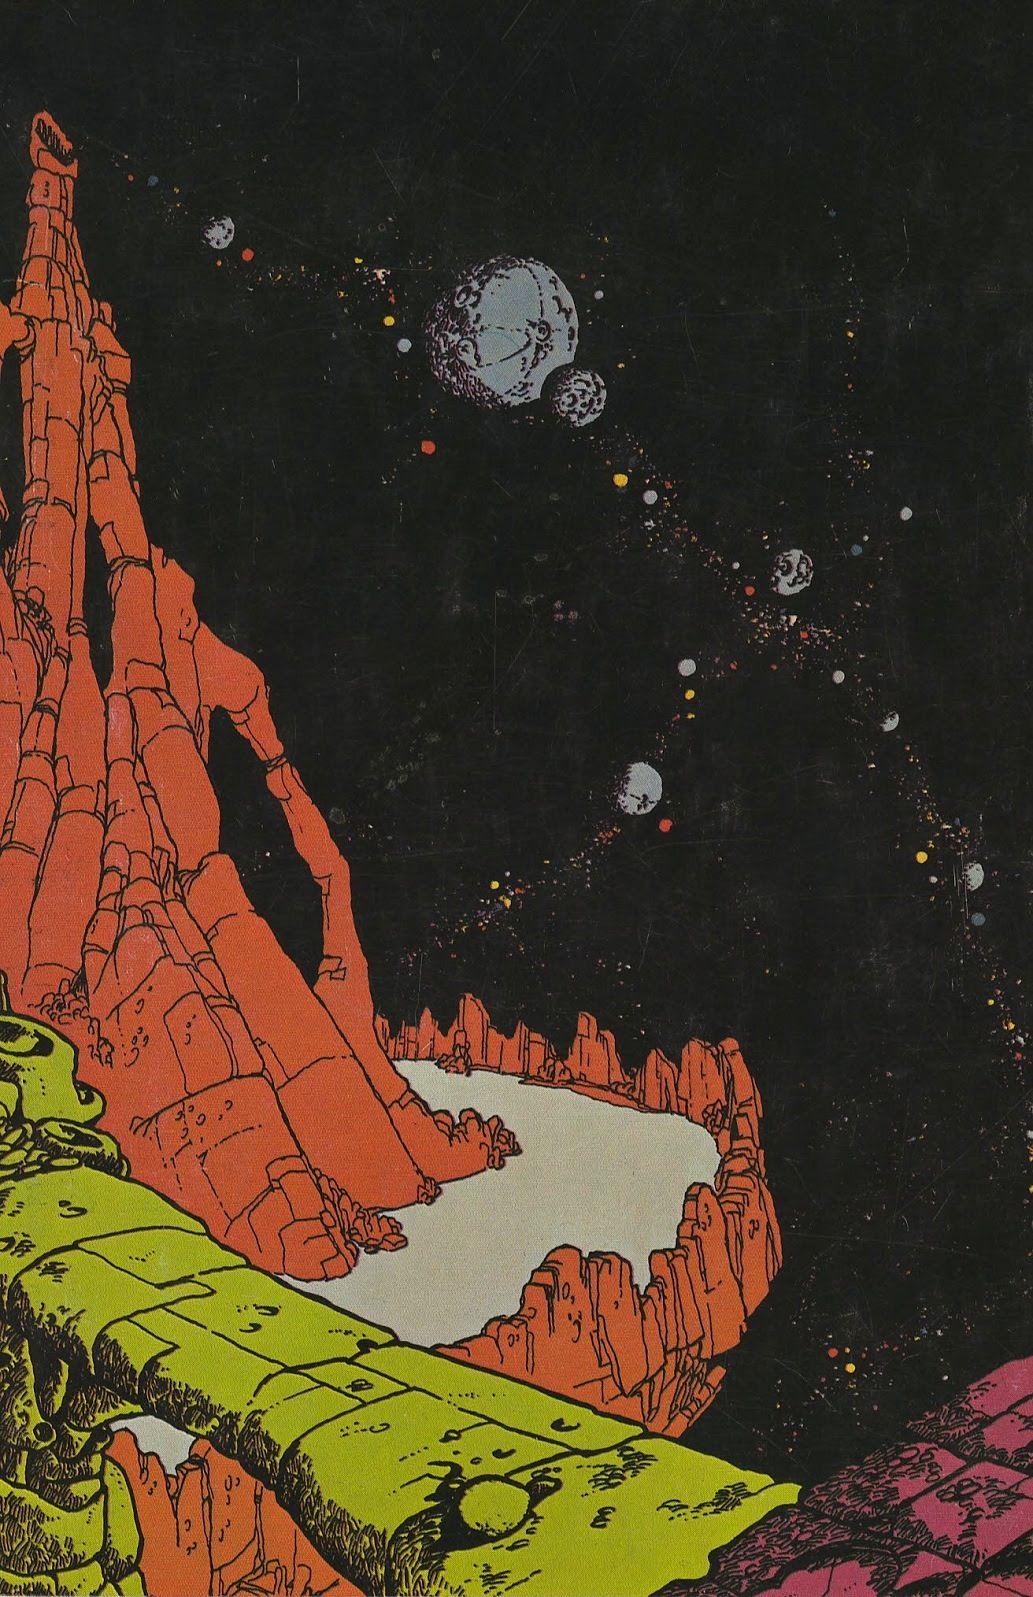 Vaughn Bodē, The dawn of time on Deadbone Mountain (The first testament of Cheech Wizard), Deadbone Erotica, 1968.